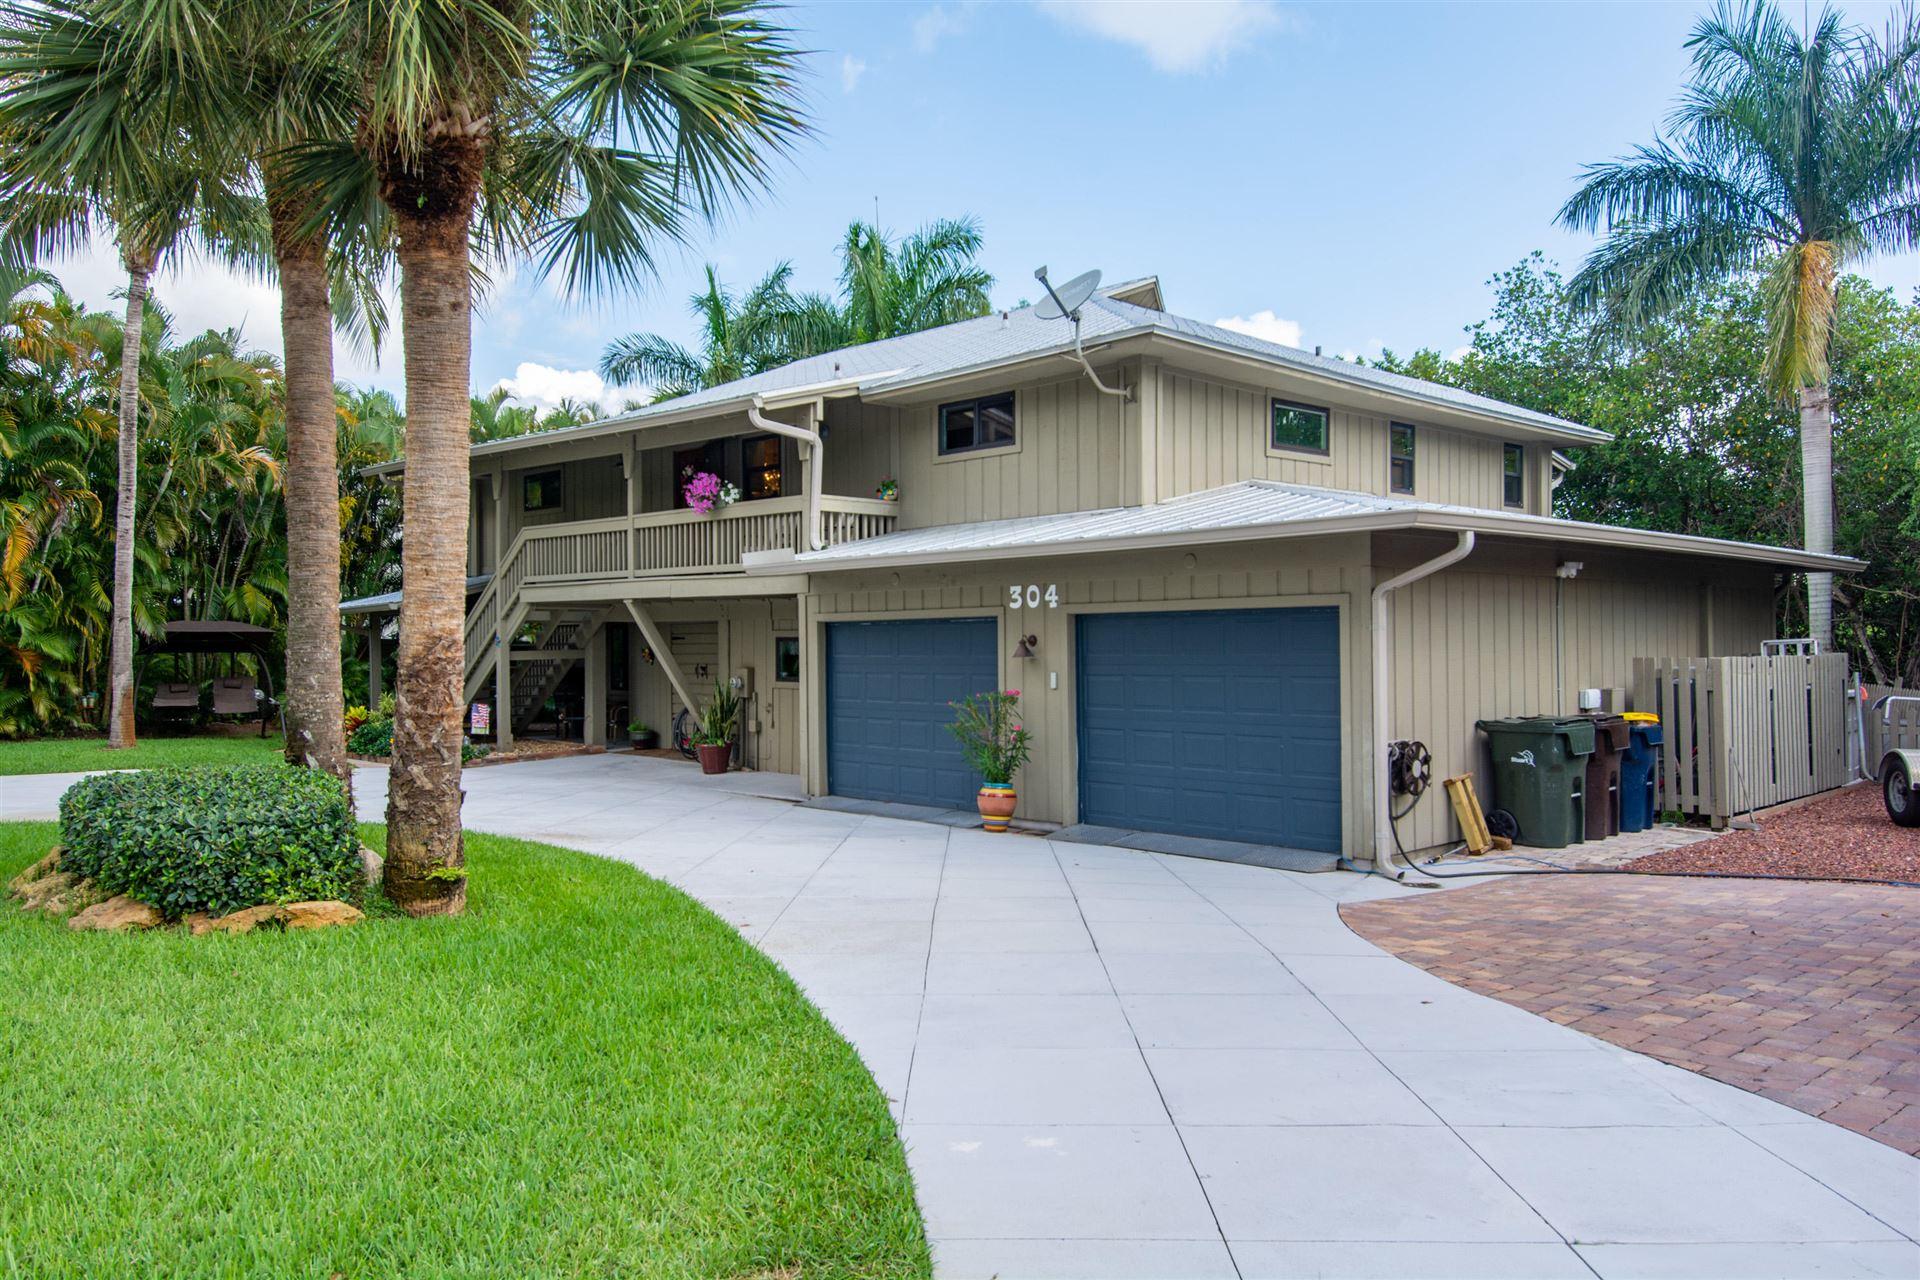 Photo of 304 SW Indian Groves Drive, Stuart, FL 34994 (MLS # RX-10735096)